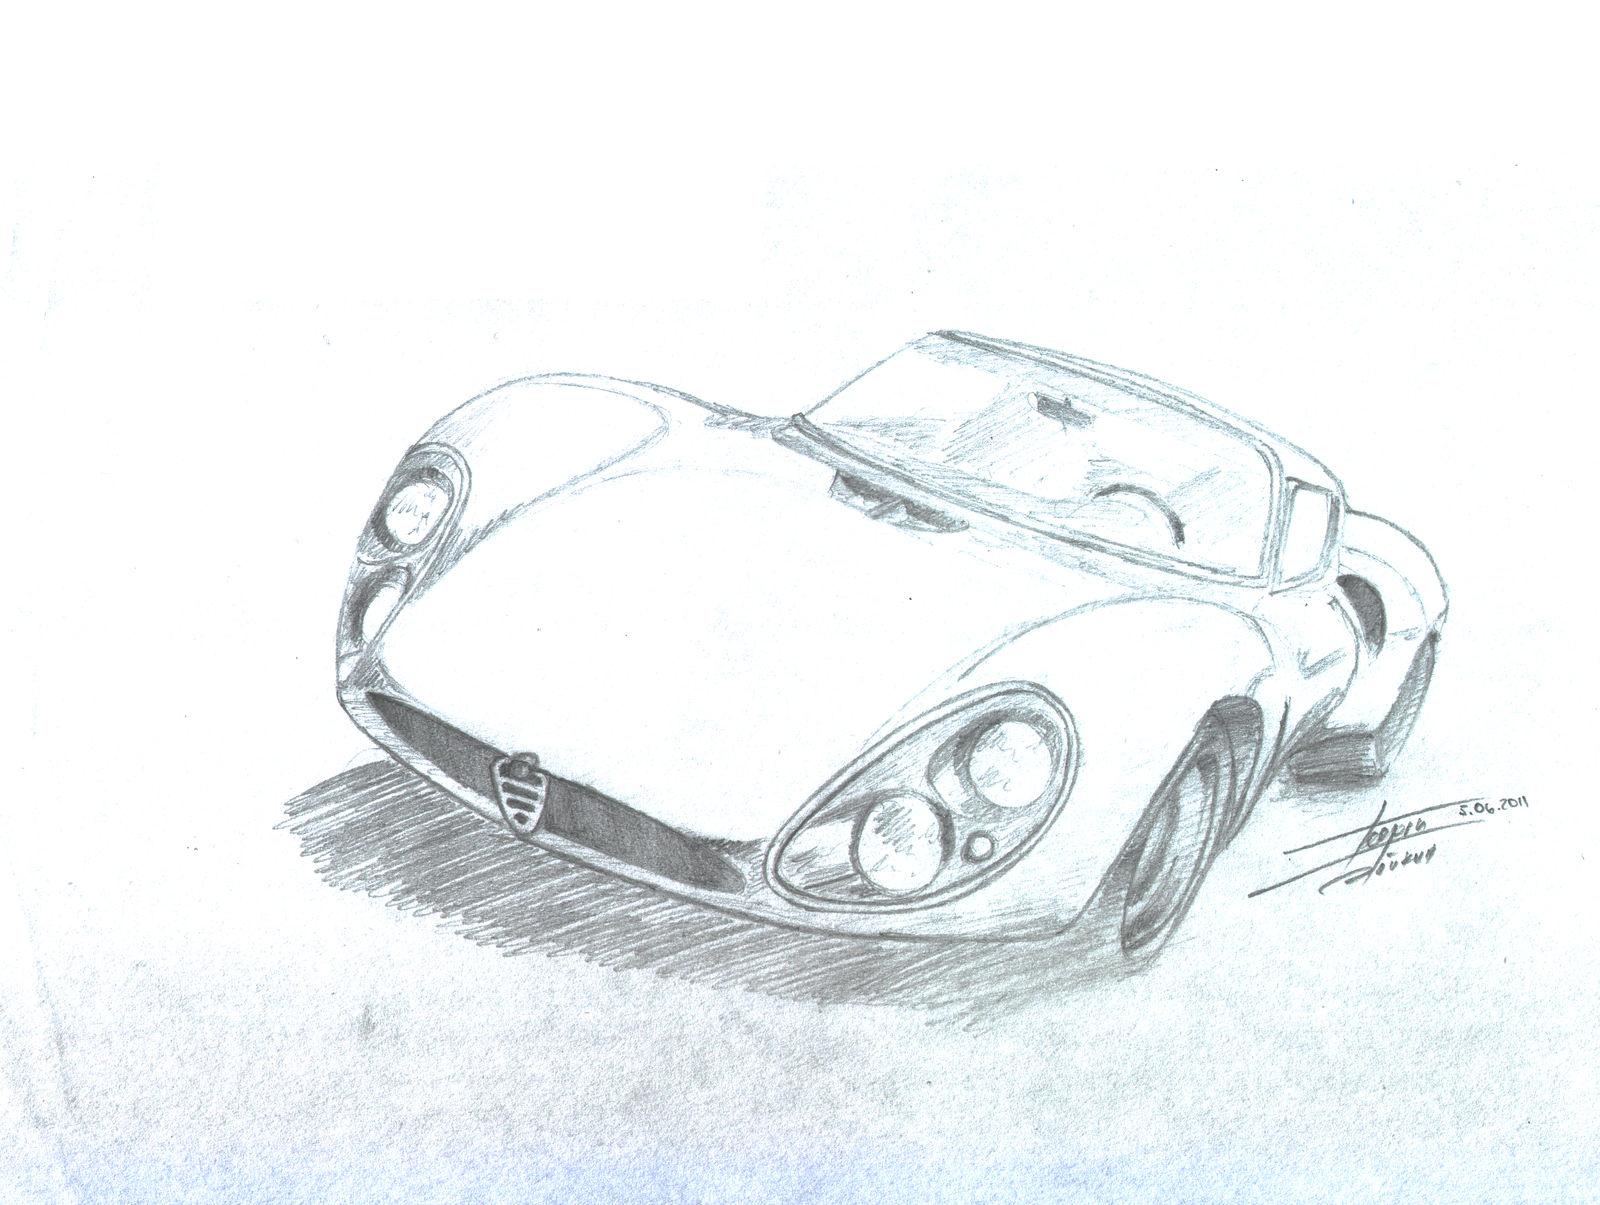 Alfa Romeo Tipo 33 Stradale by georgiboykin